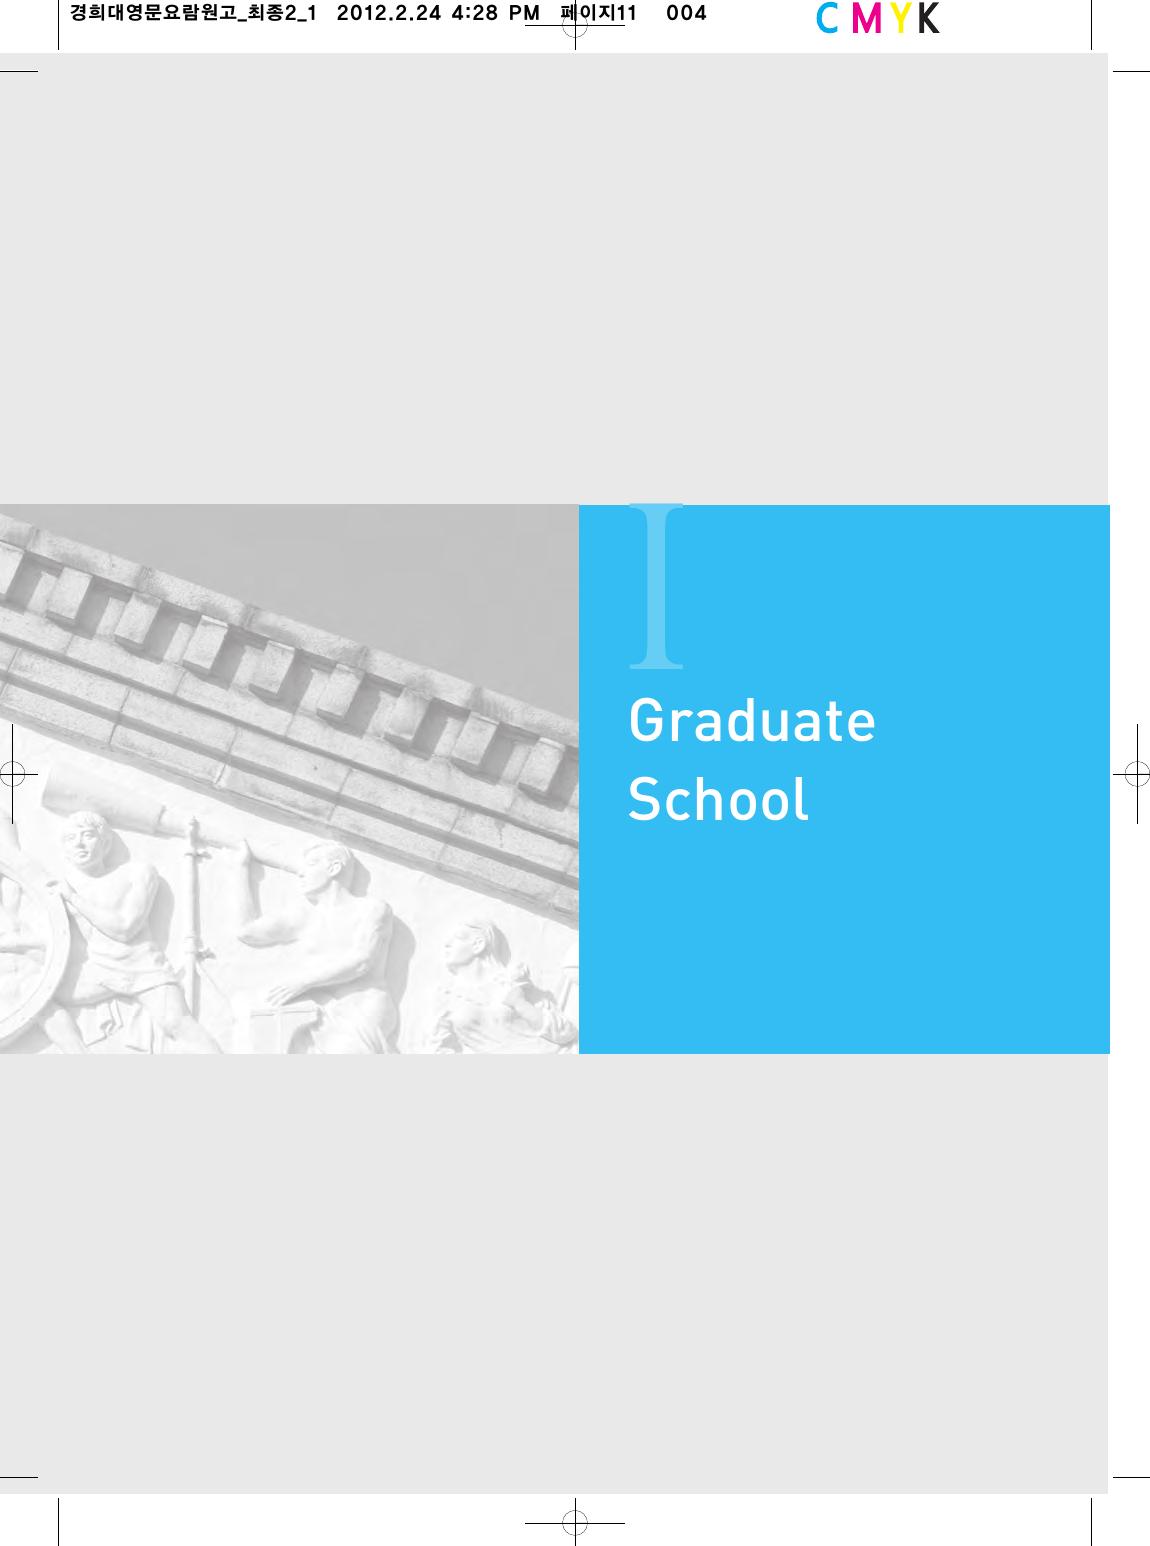 Graduate School | manualzz com